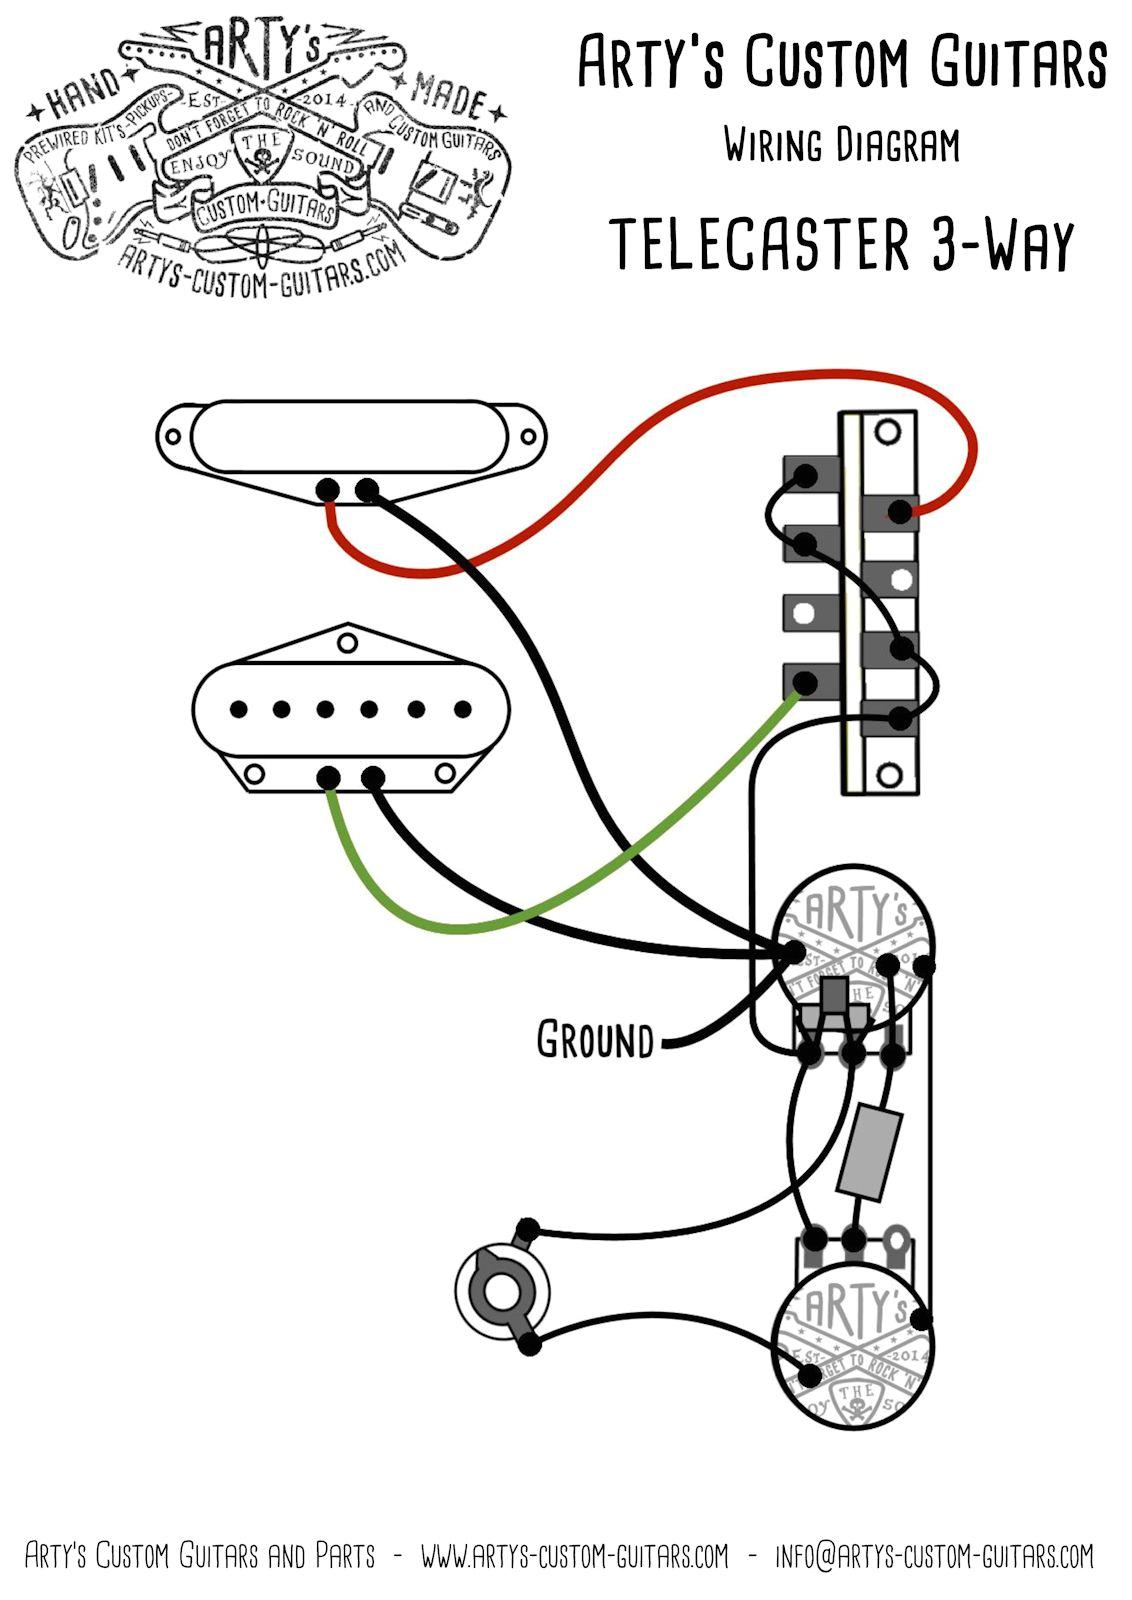 Wiring Diagram Telecaster Arty S Custom Guitars Wiring Diagram Plan Telecaster assembly